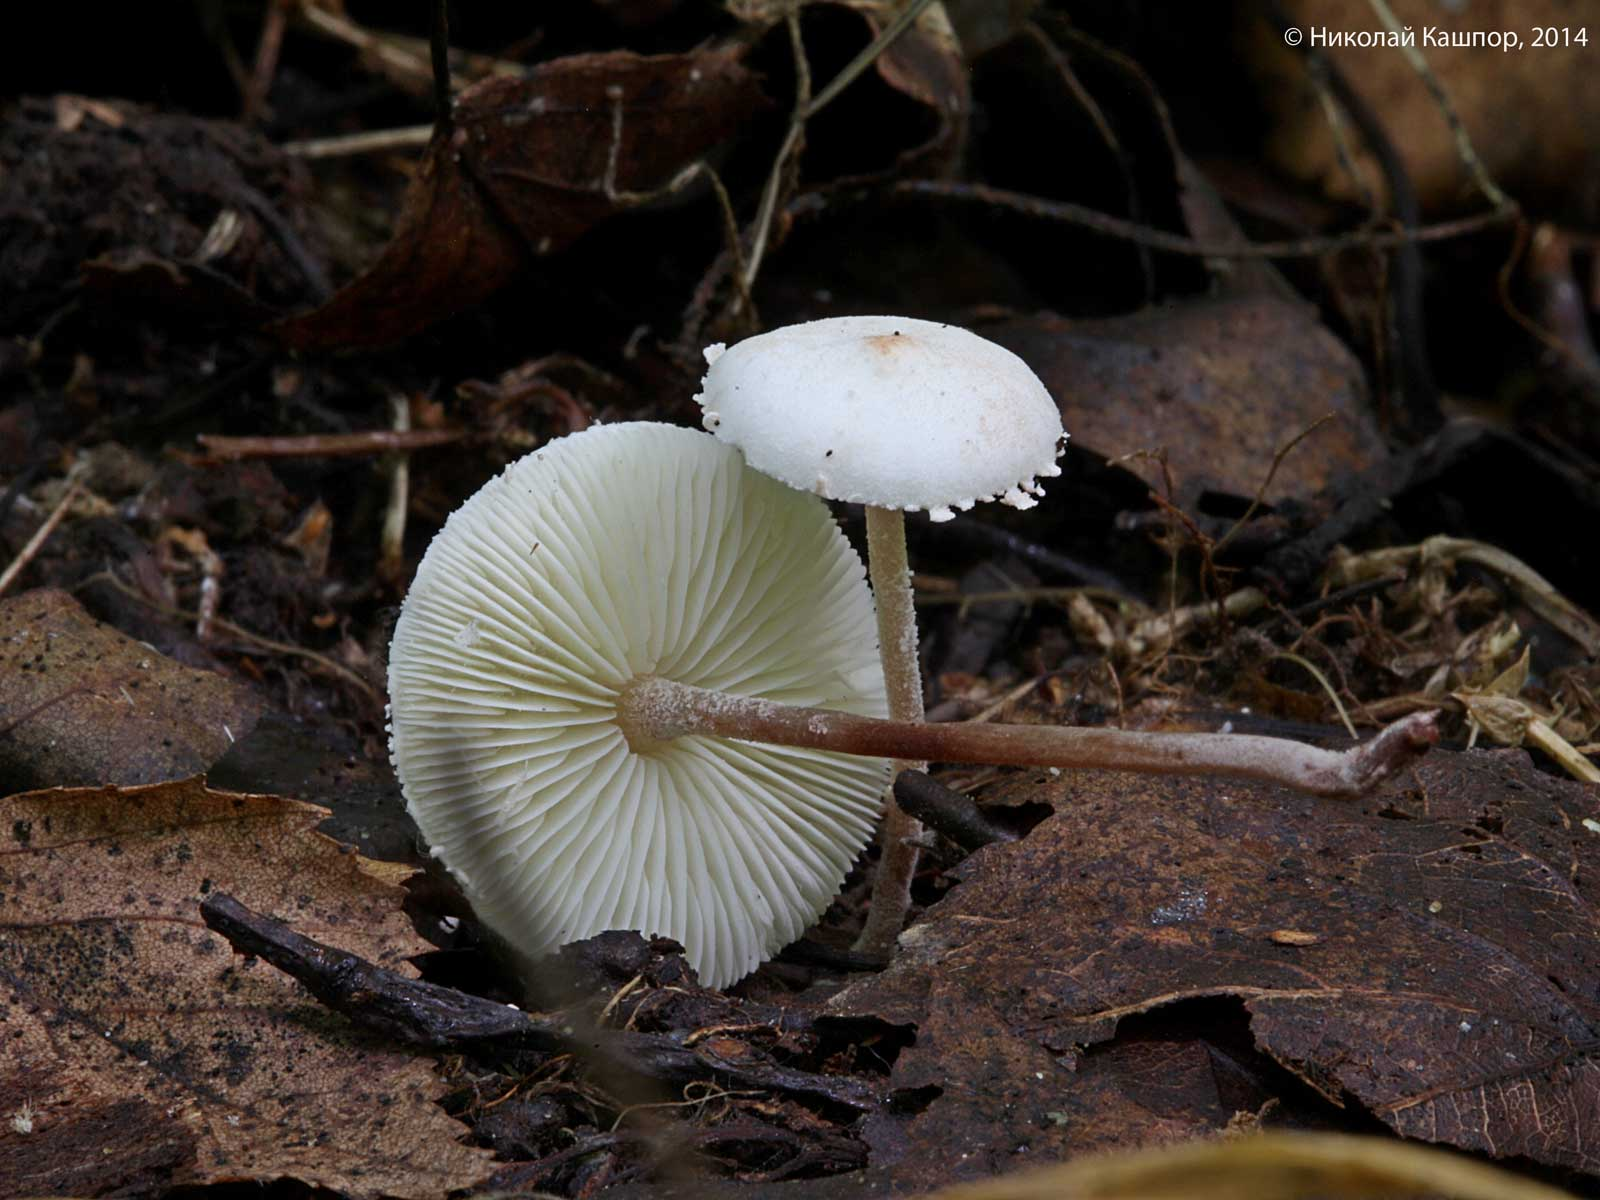 Cystolepiota seminuda. Автор фото:Кашпор Николай